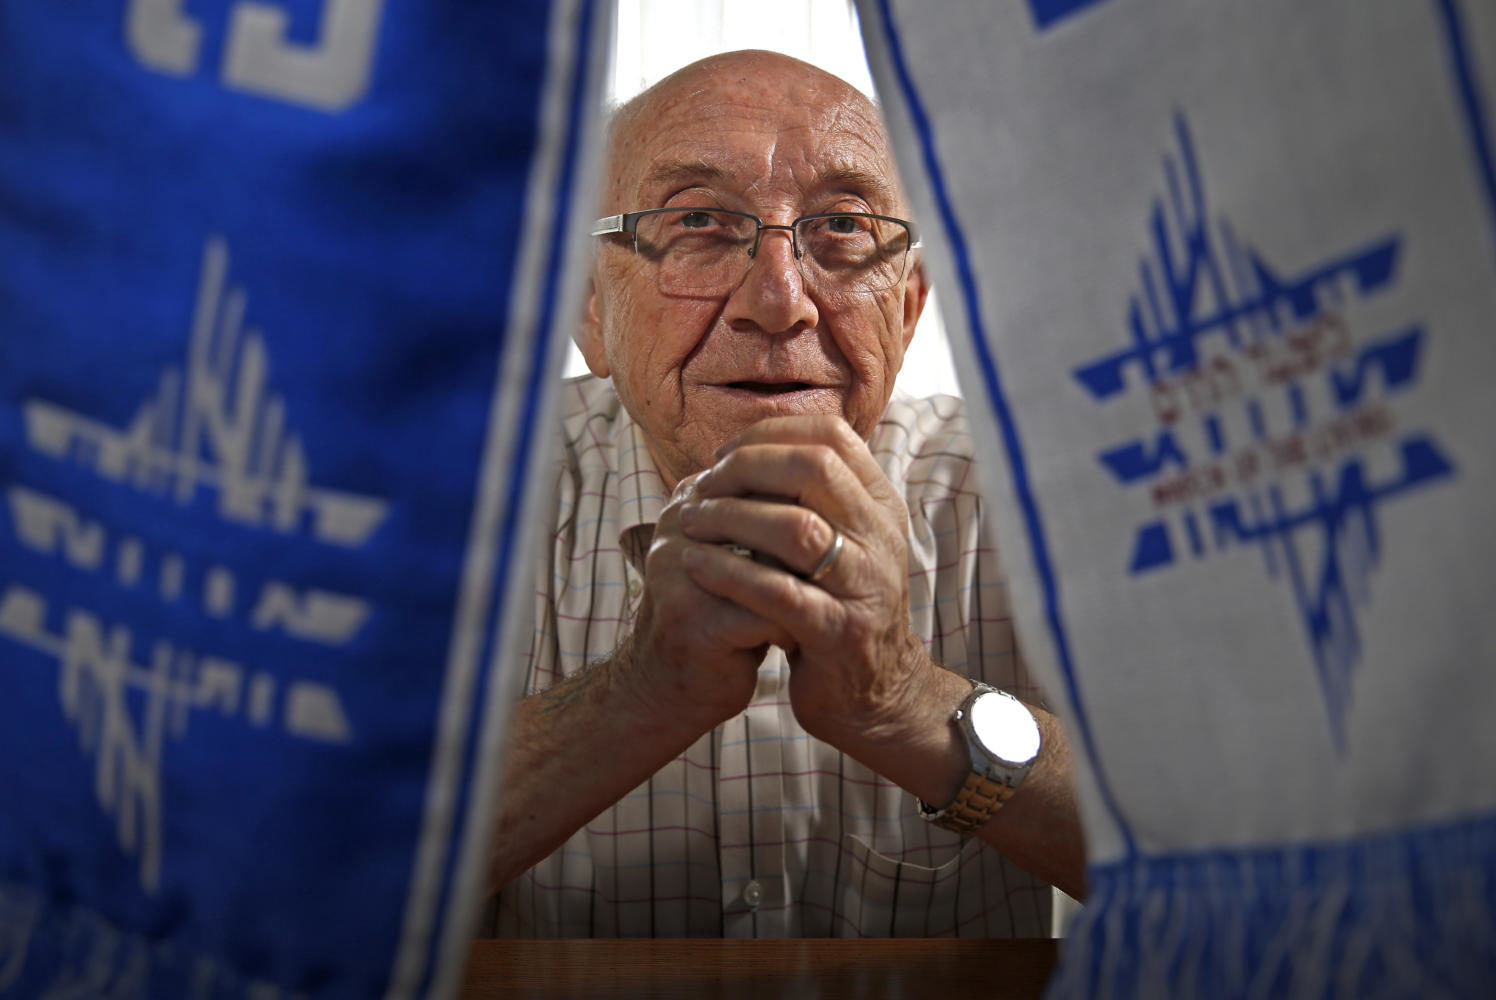 Max Glauben, a Holocaust survivor, with a